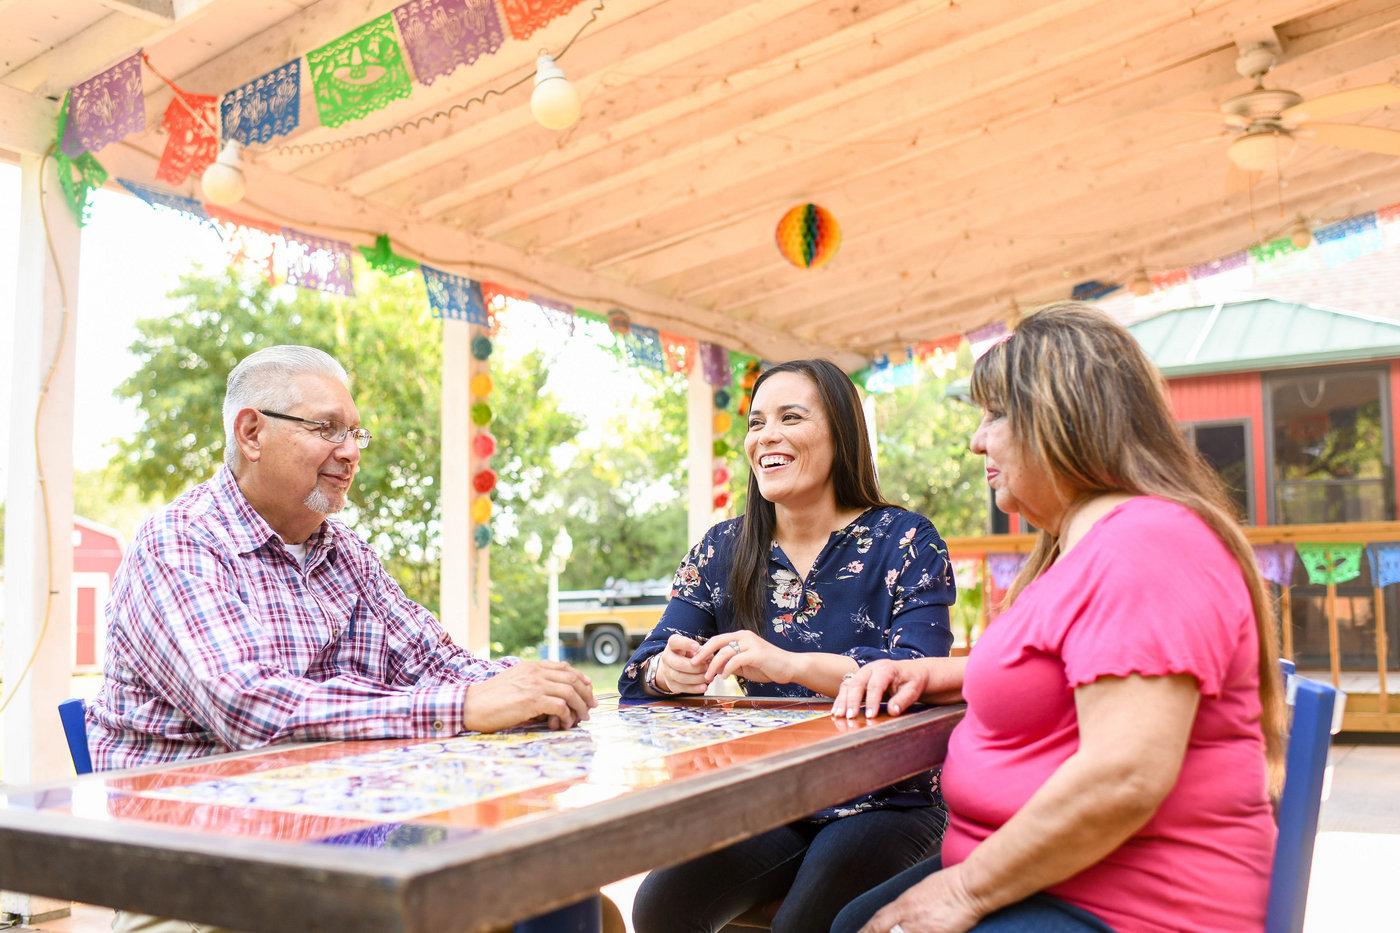 Fort Stockton Meet & Greet with Gina Ortiz Jones